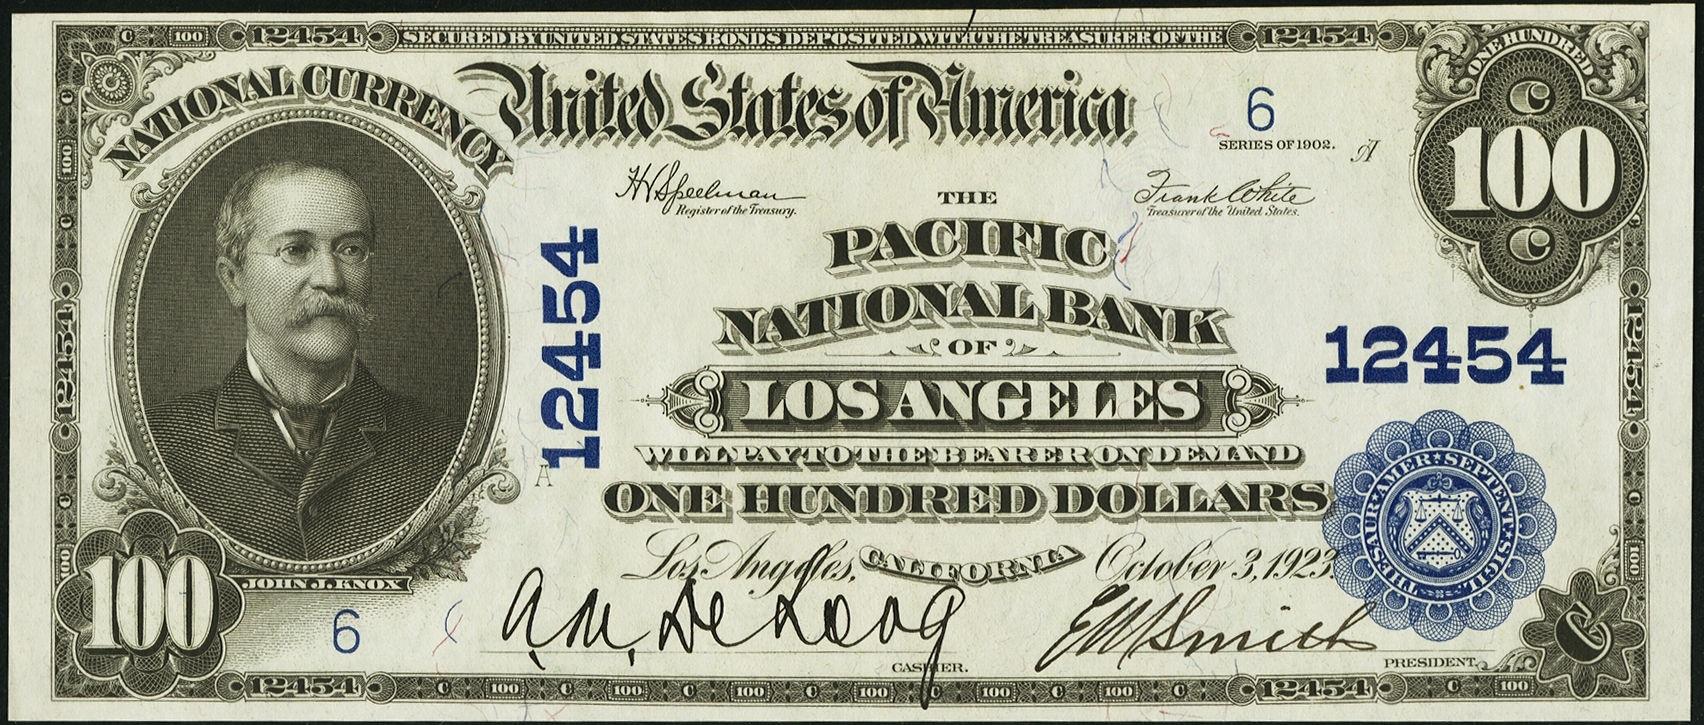 $100 1902